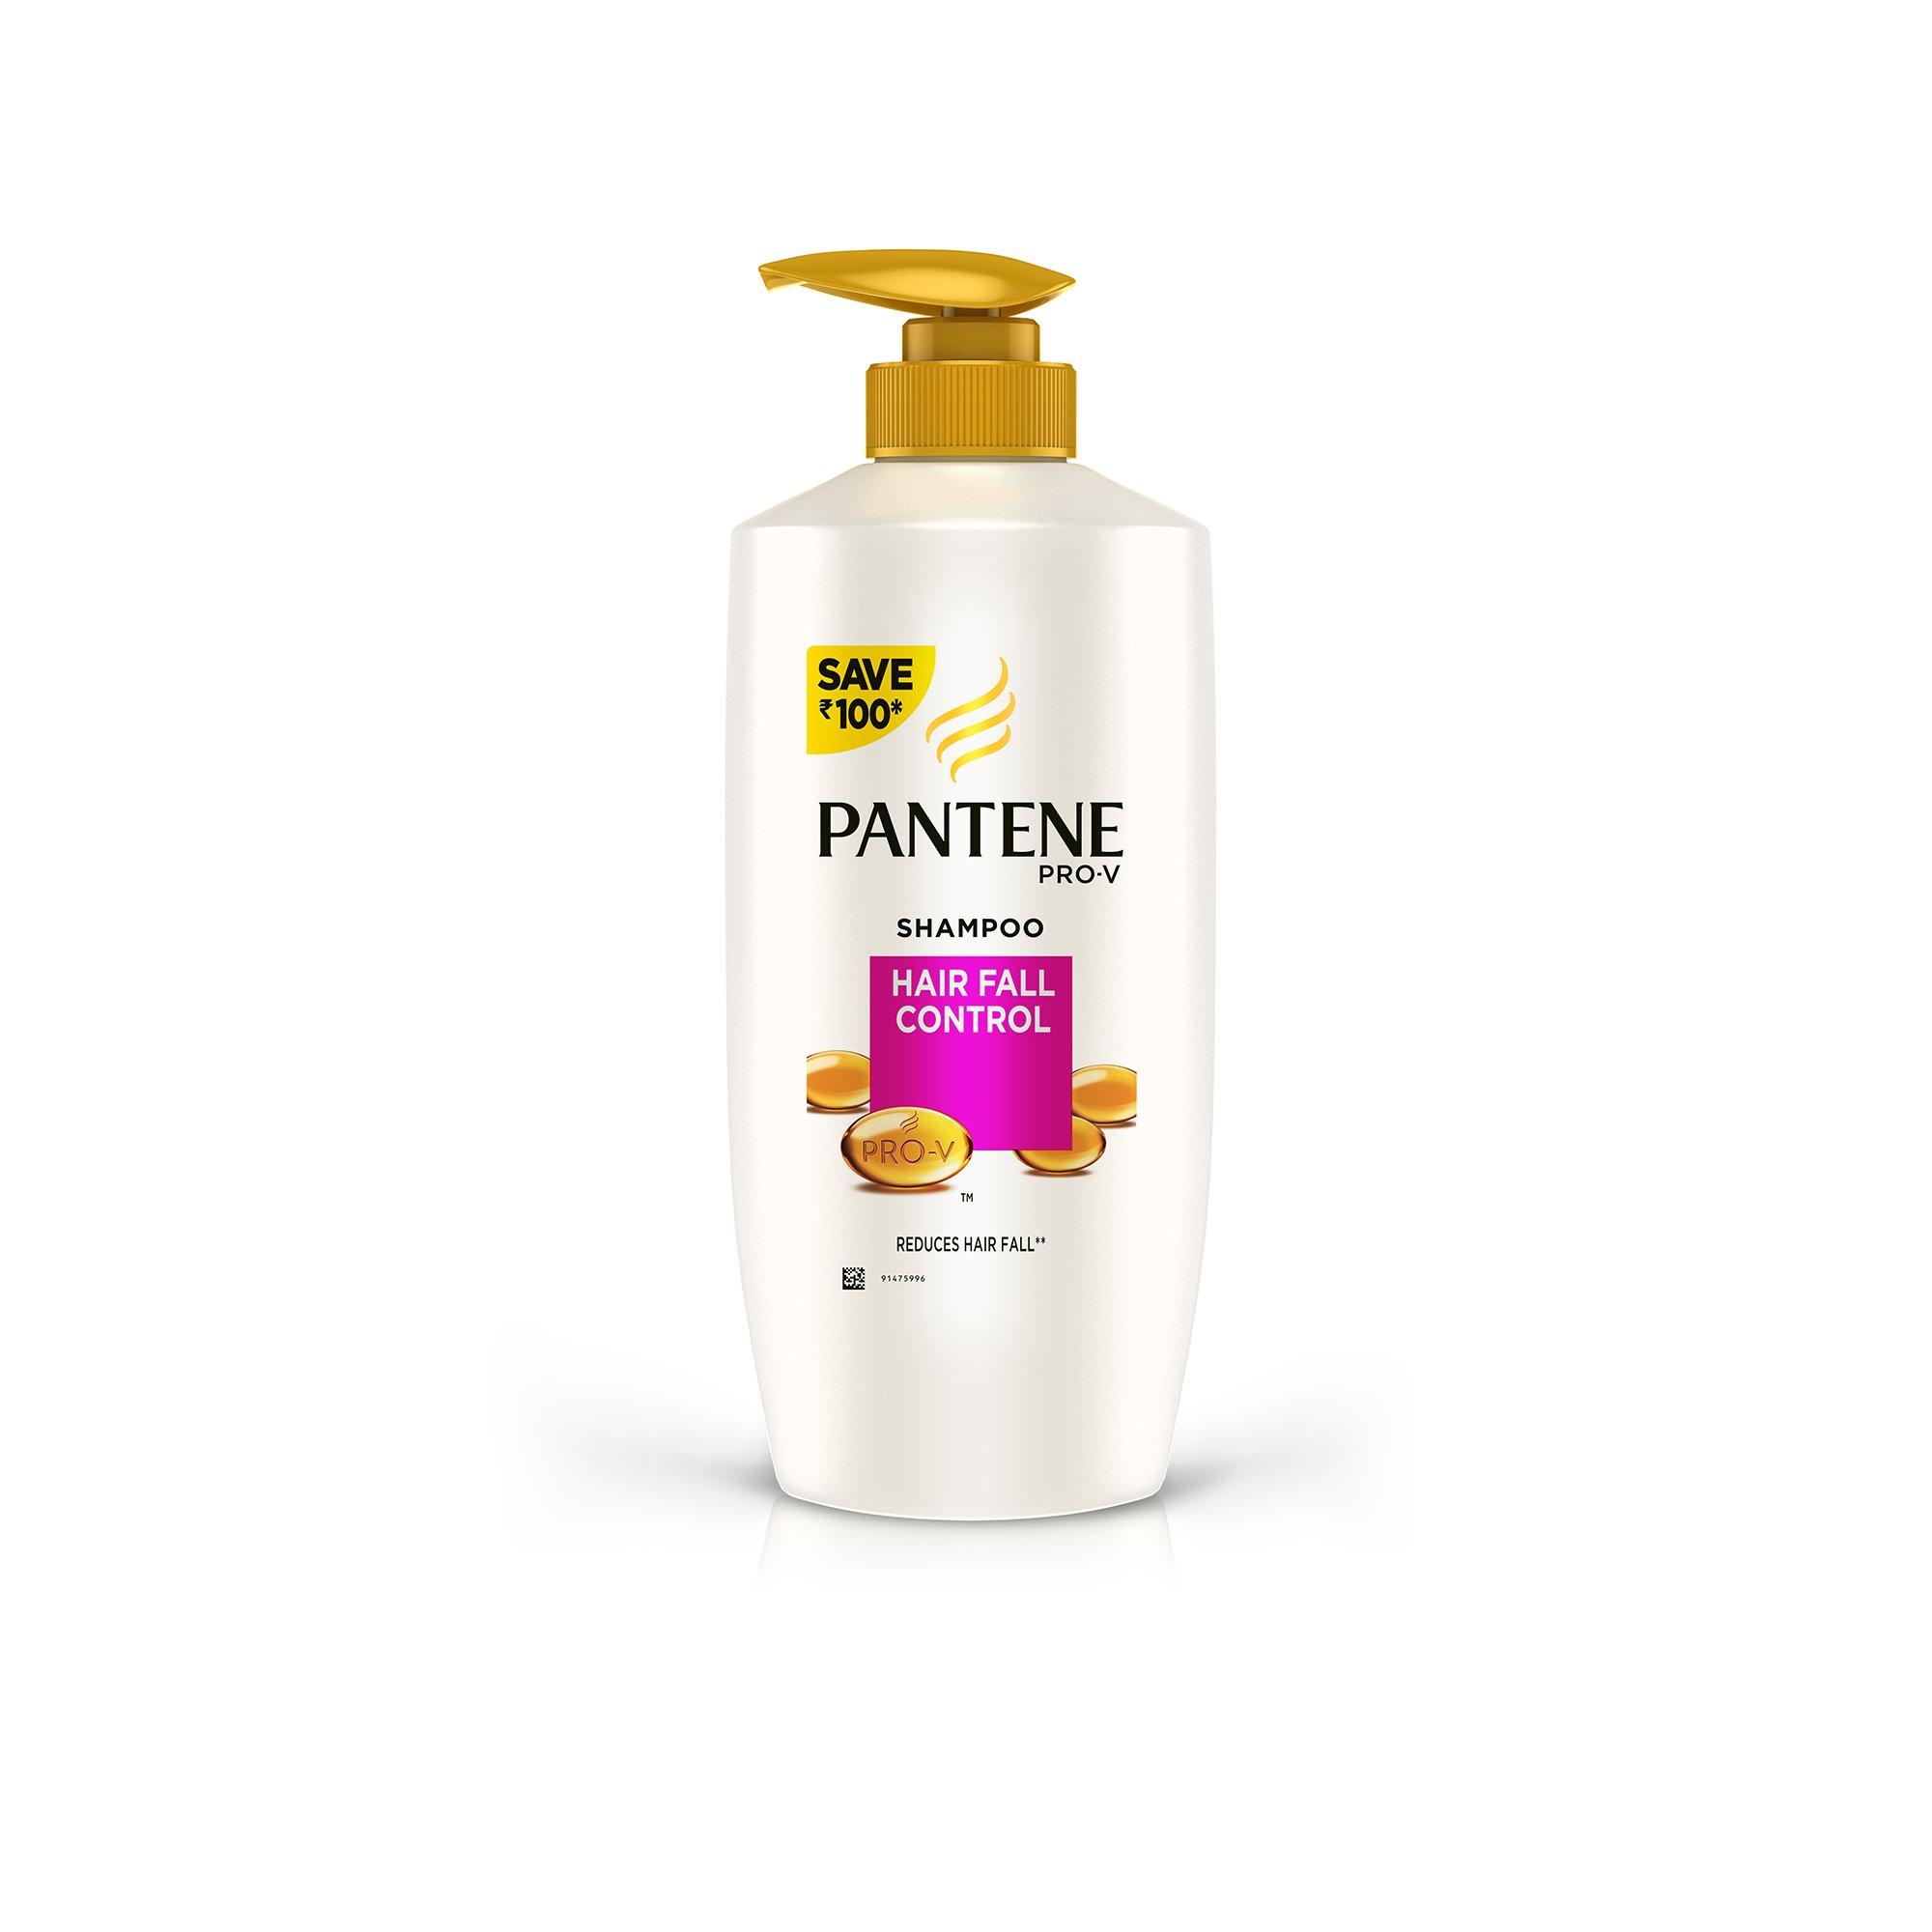 Pantene Hairfall Control Shampoo, 675ml product image